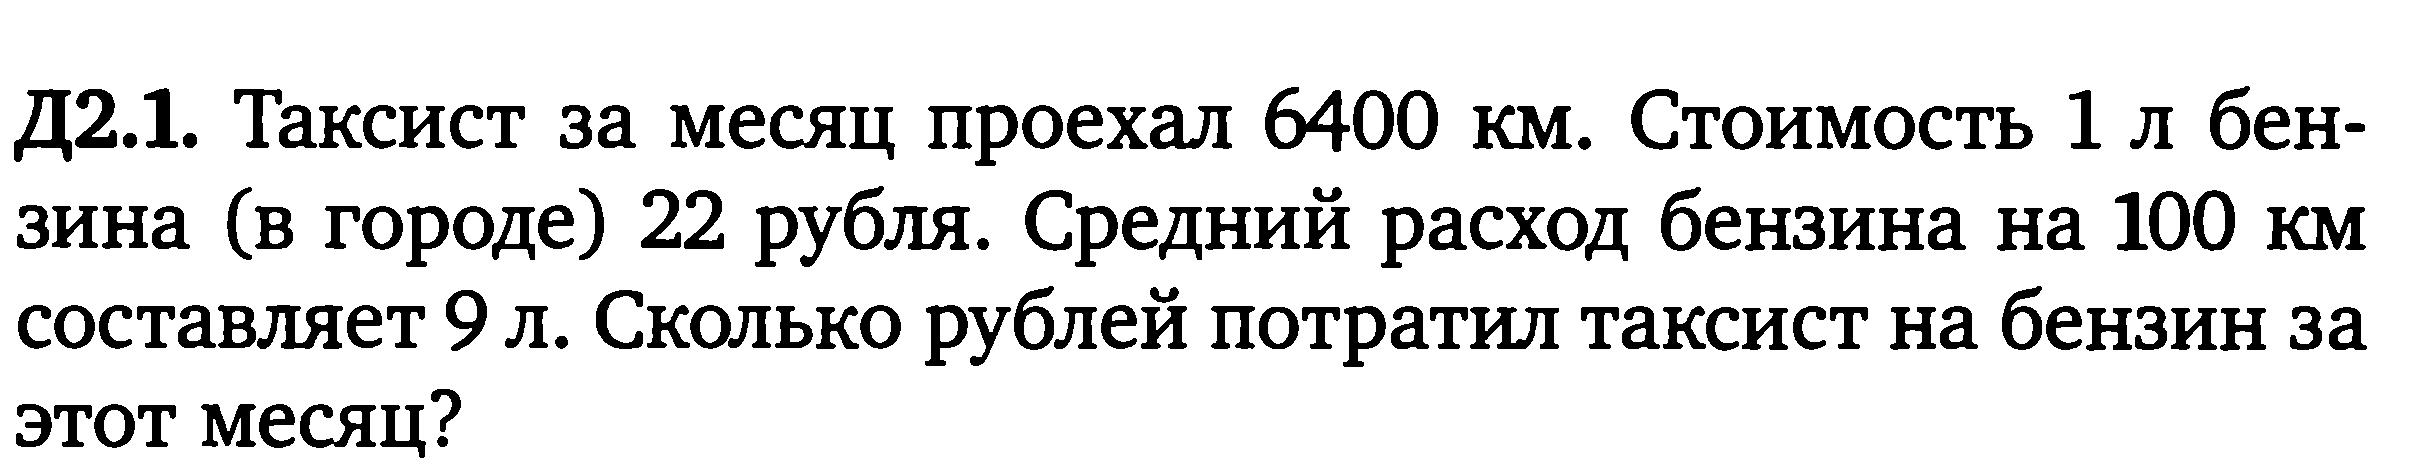 hello_html_71b15280.png